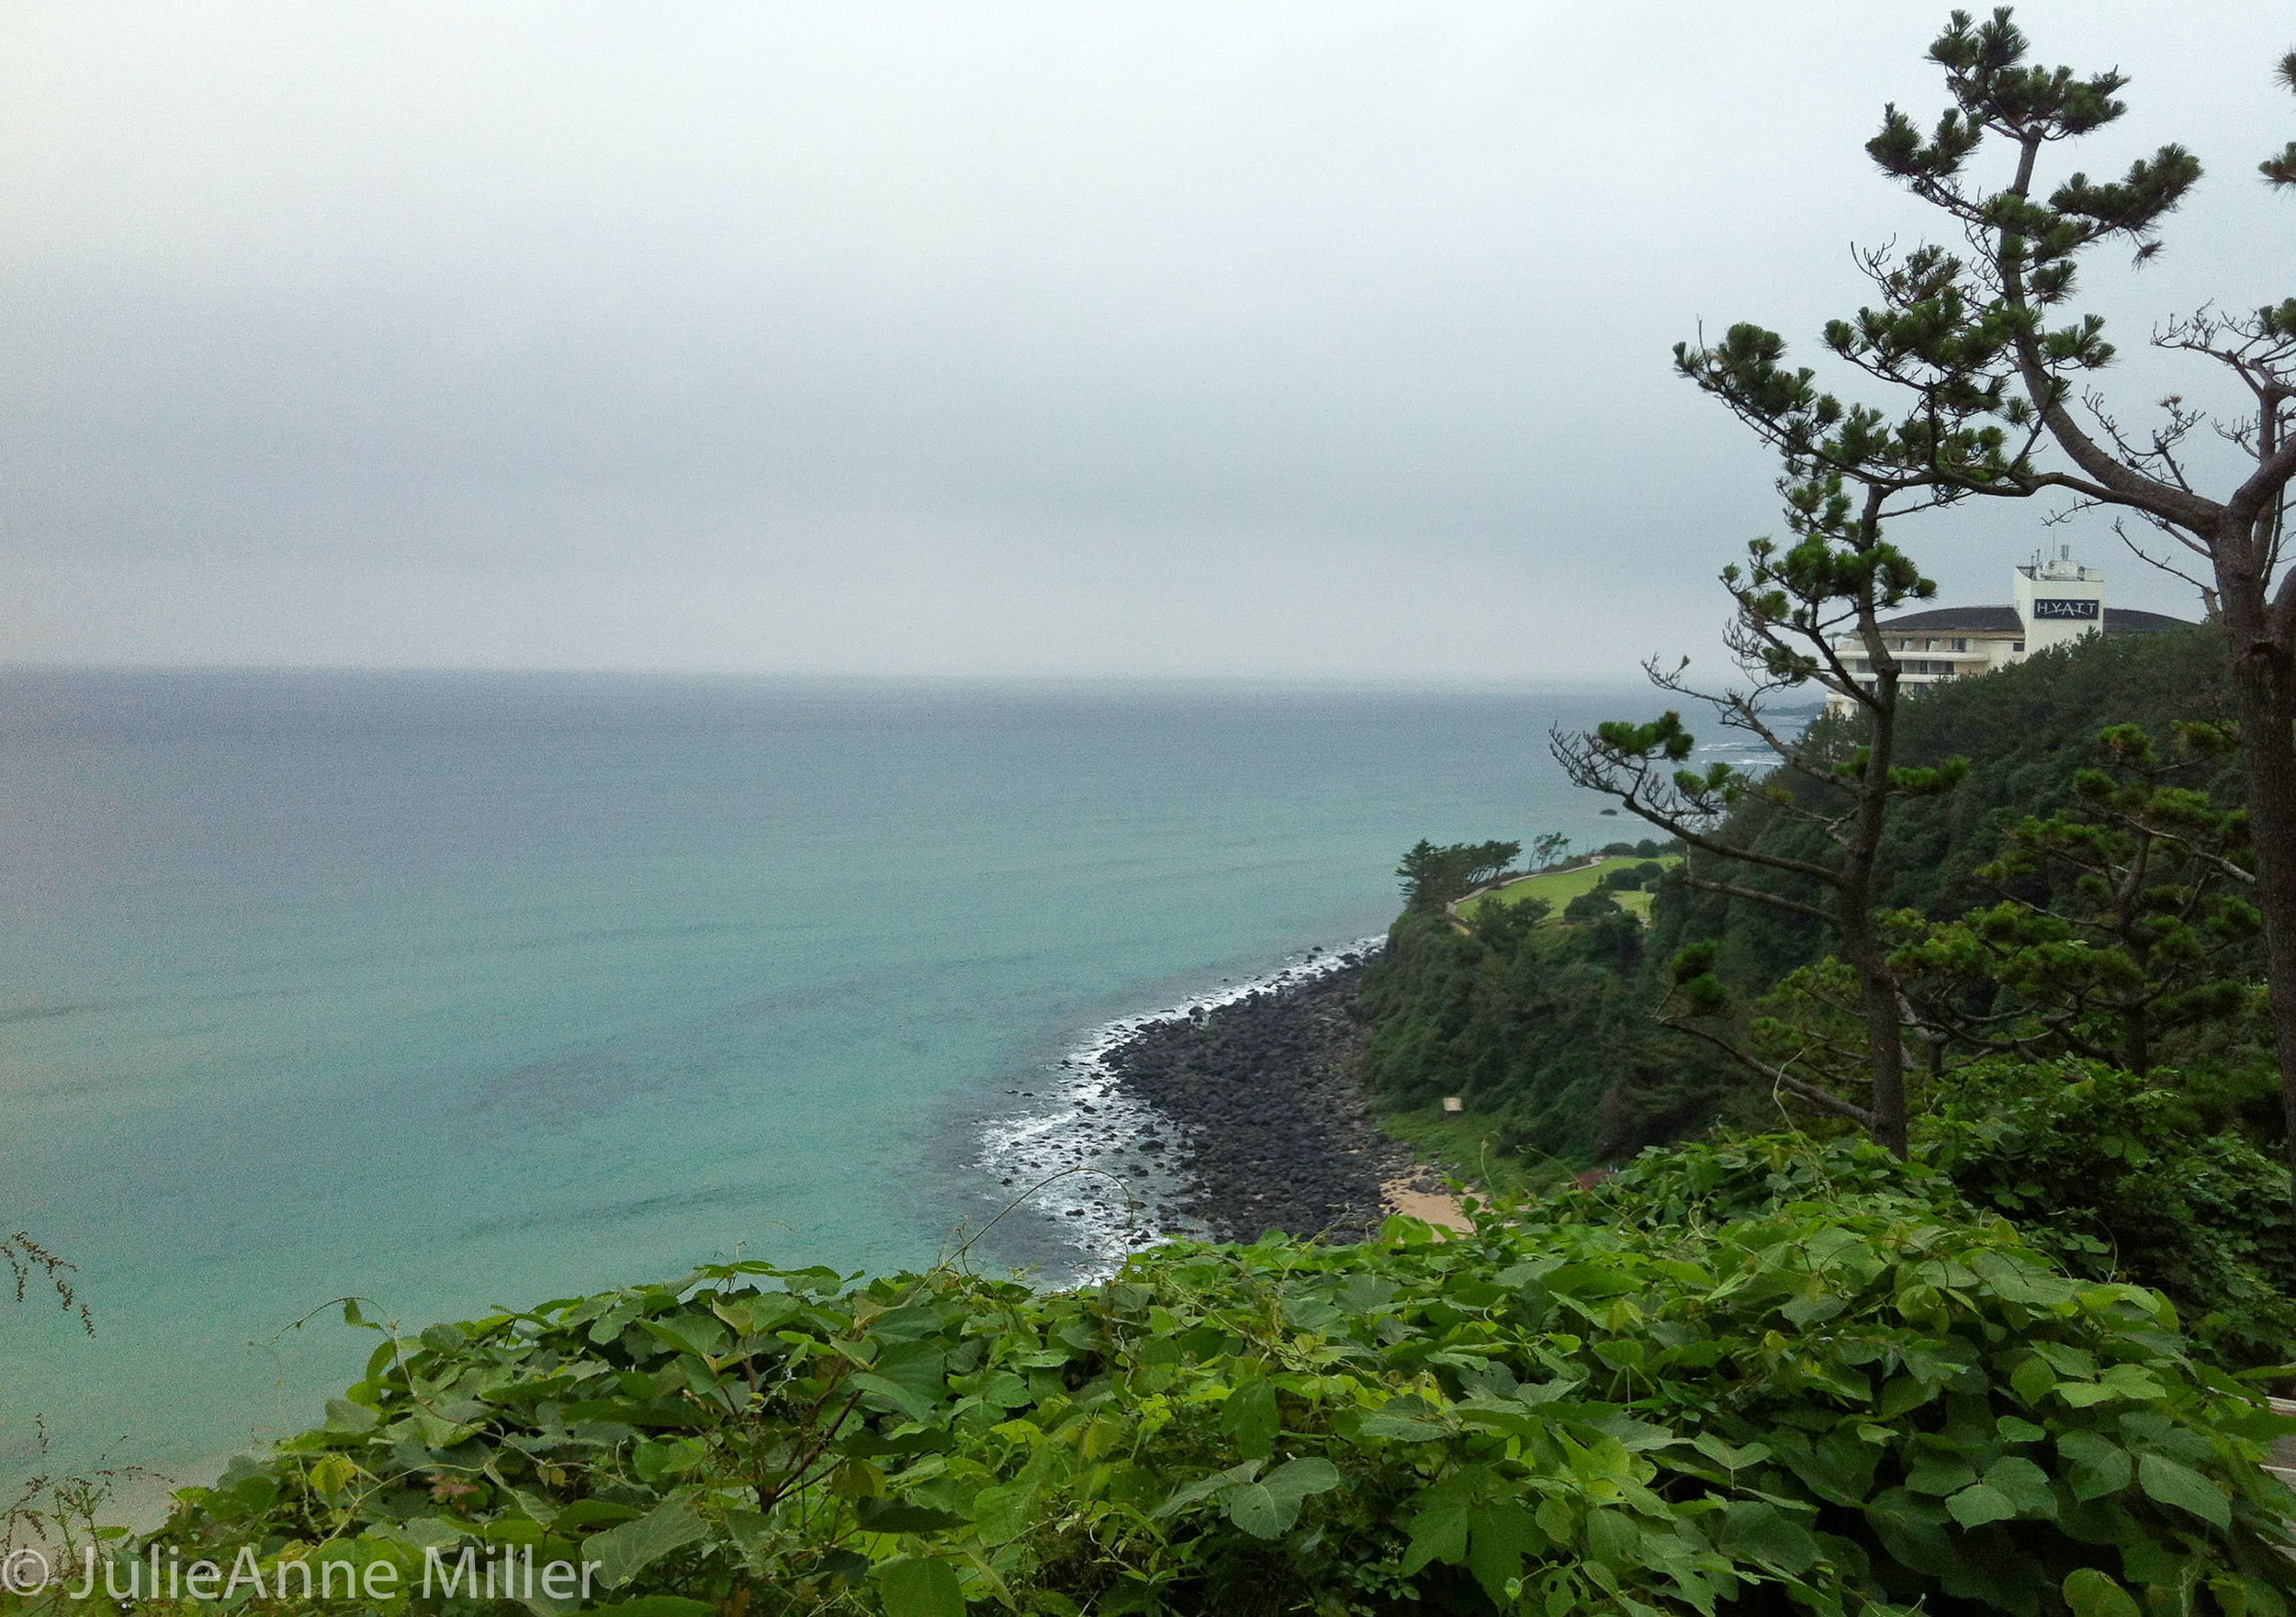 Seogwipo Jeju Island Jungmun resort area (중문관광단지)